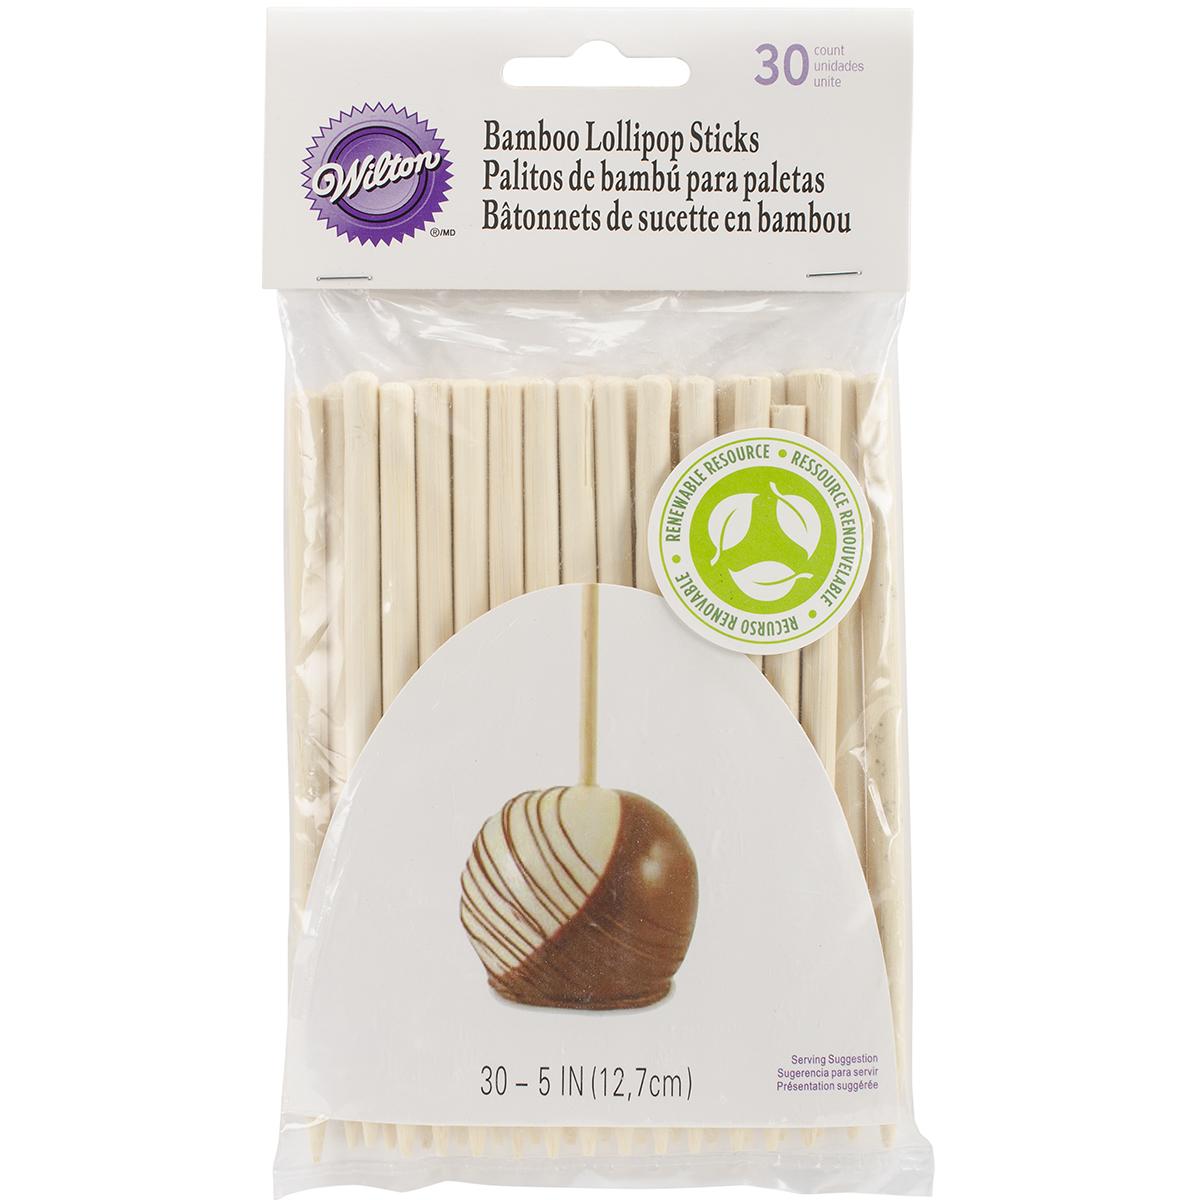 Bamboo Lollipop Stick 30 ct